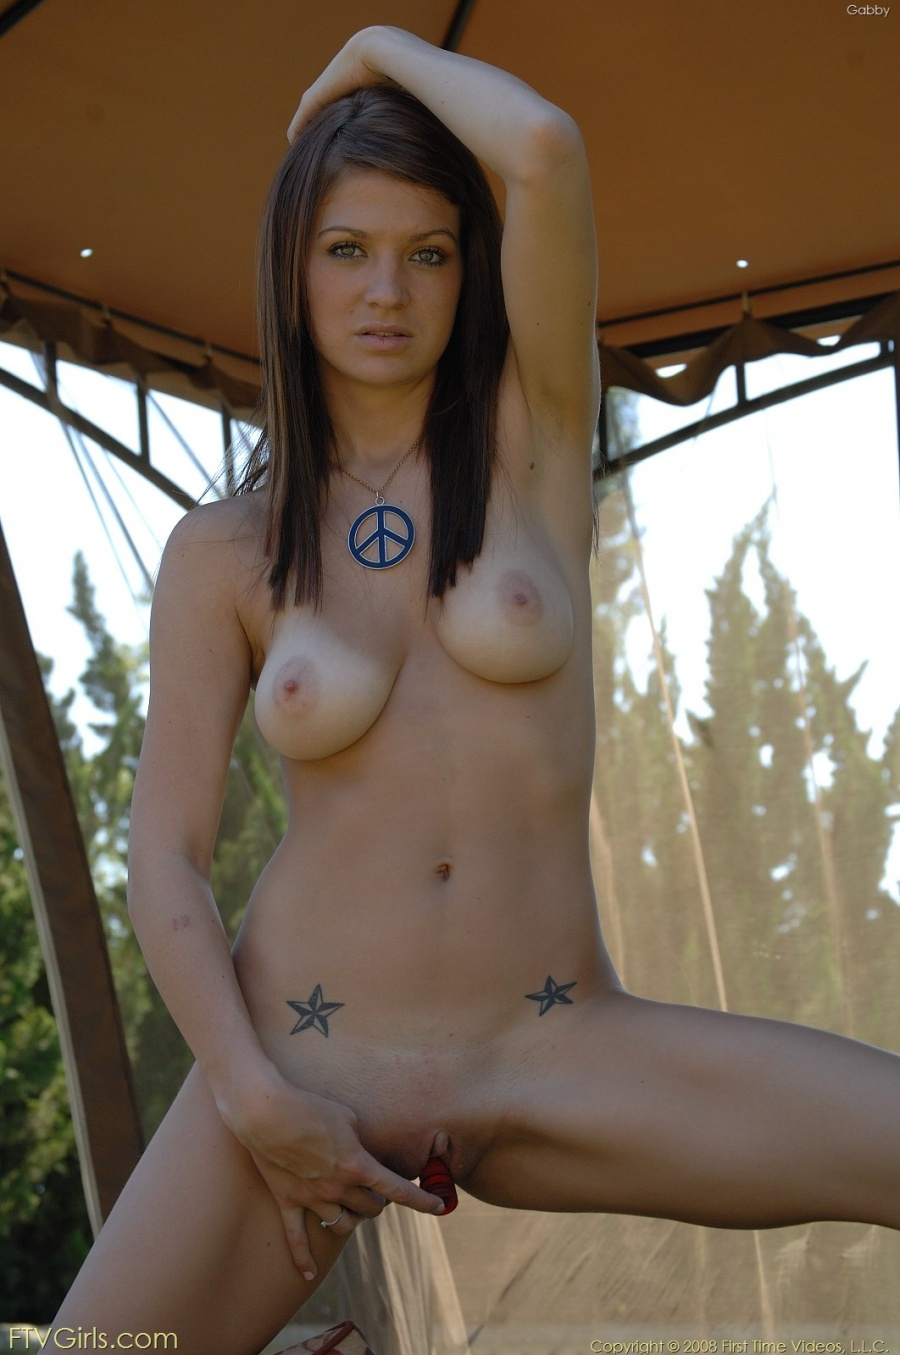 gabby Naked babe